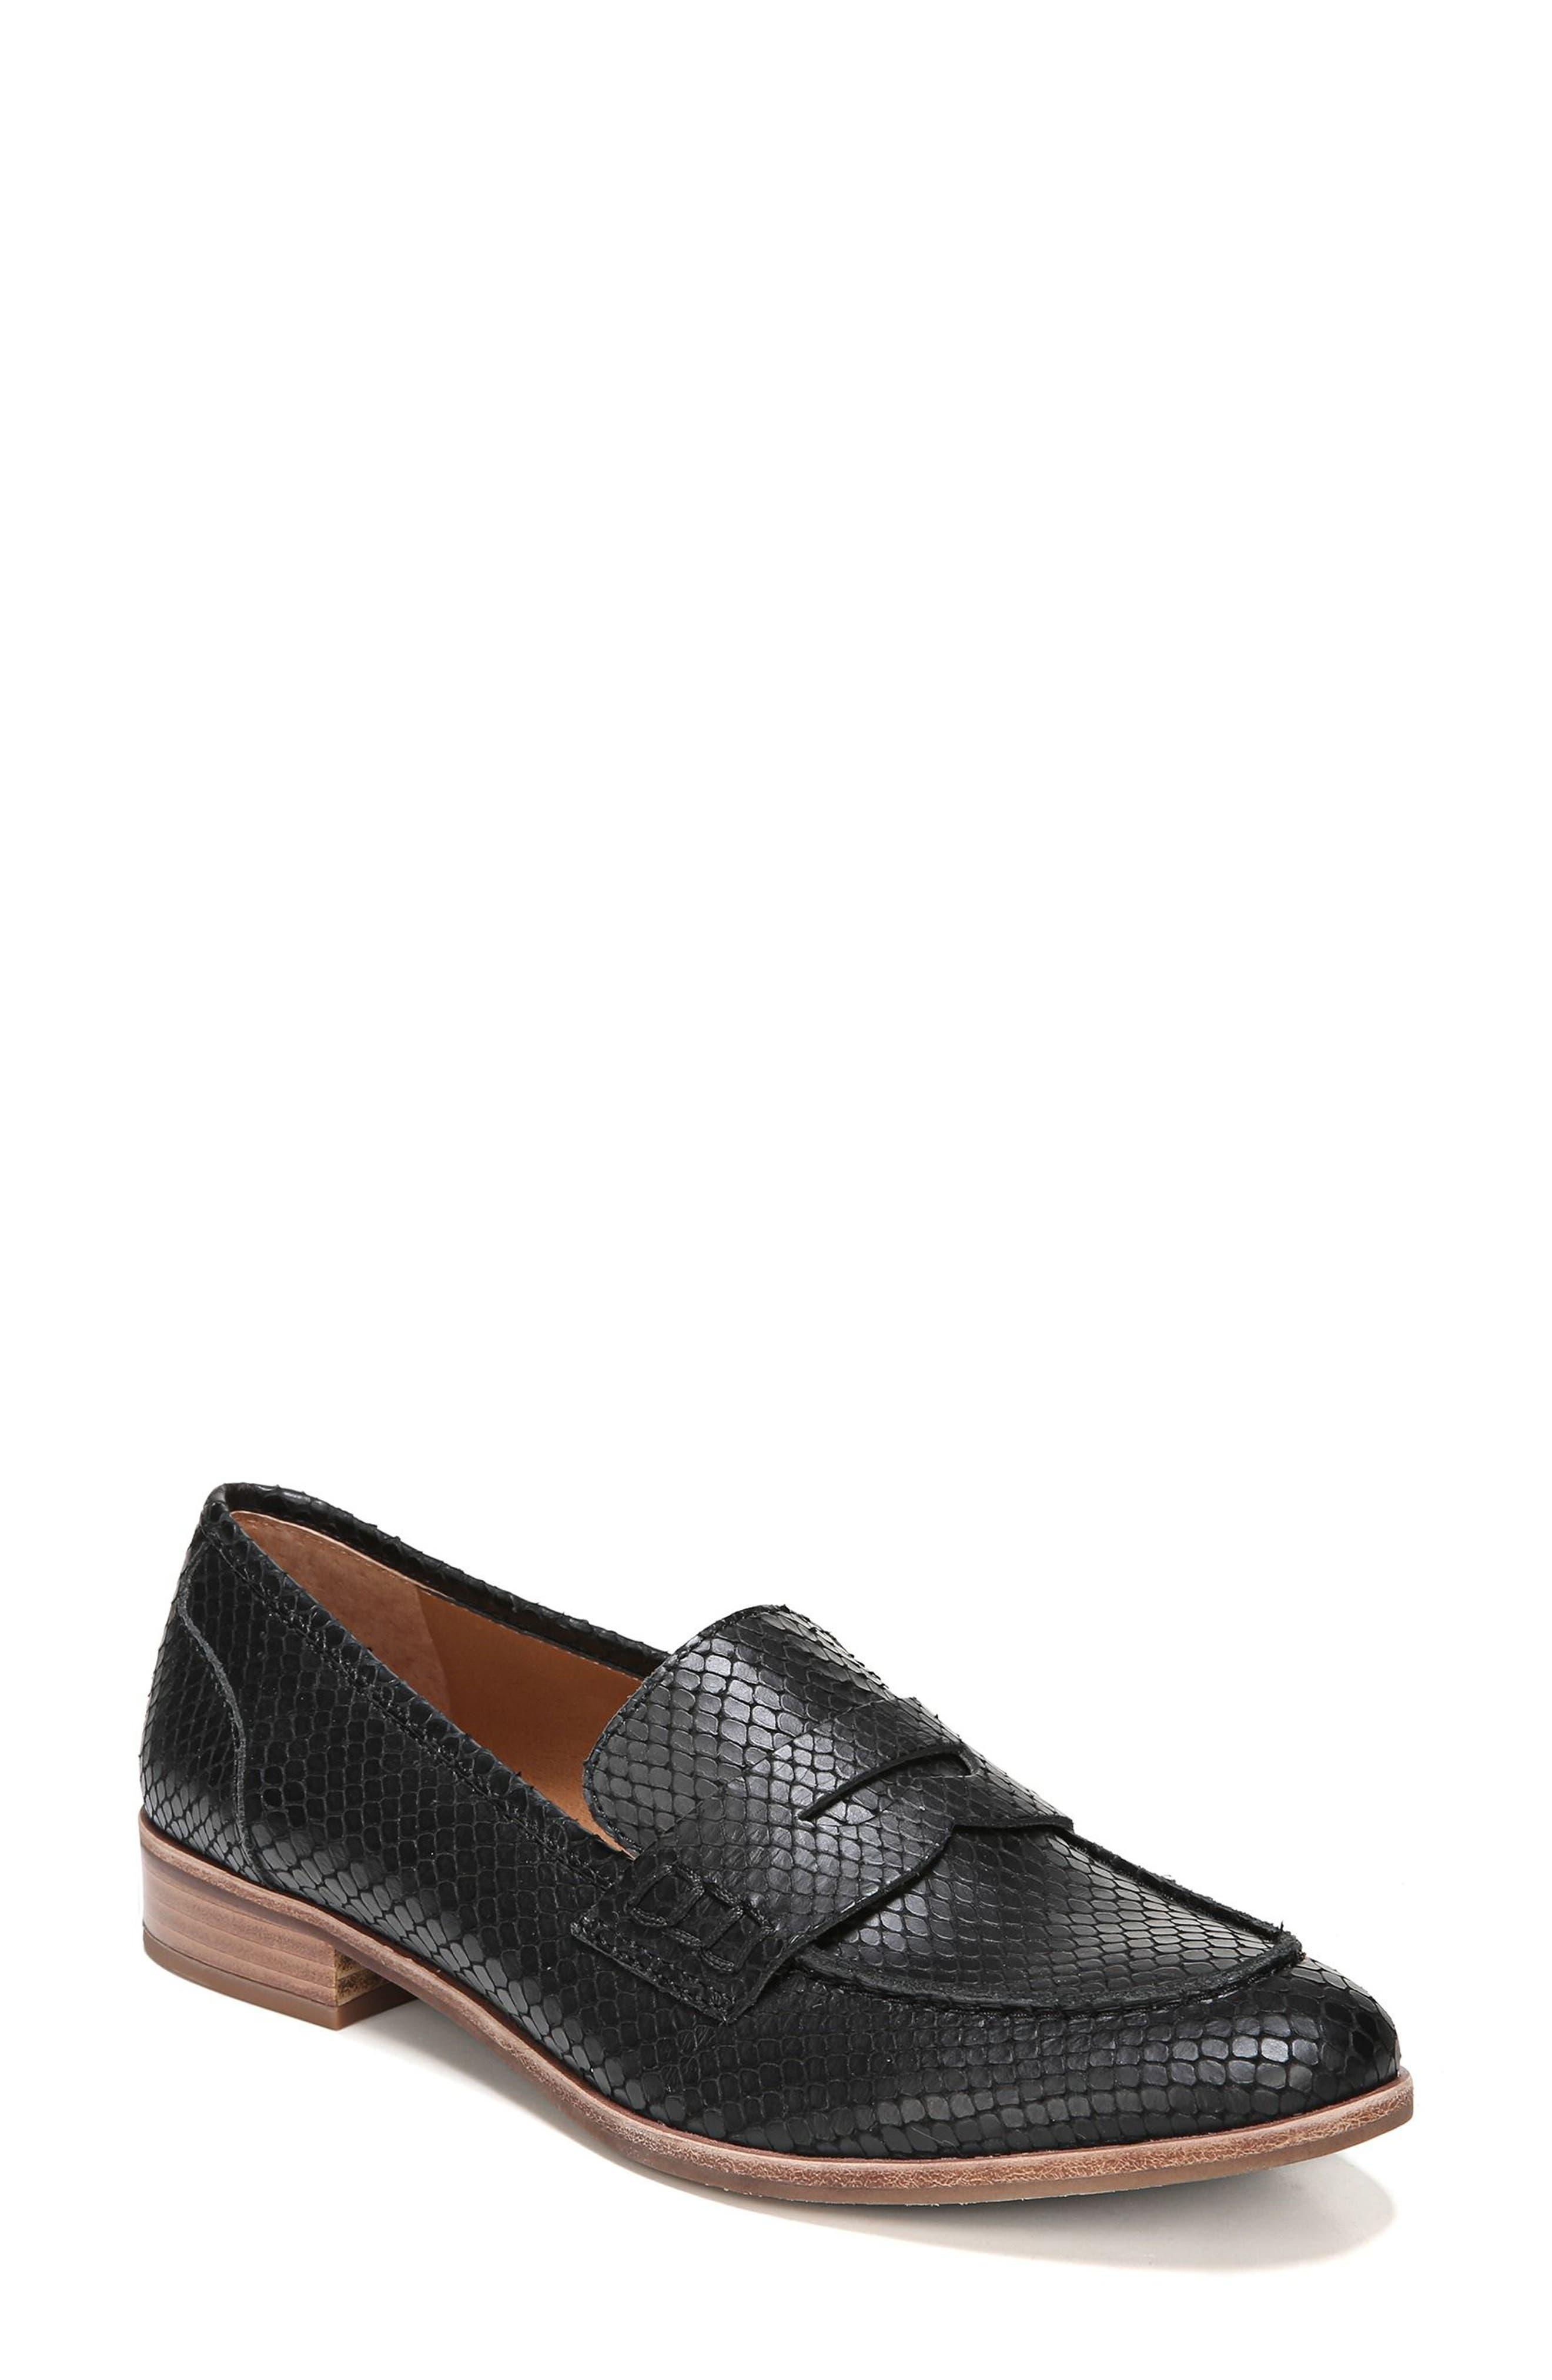 'Jolette' Penny Loafer,                         Main,                         color, Black Printed Leather